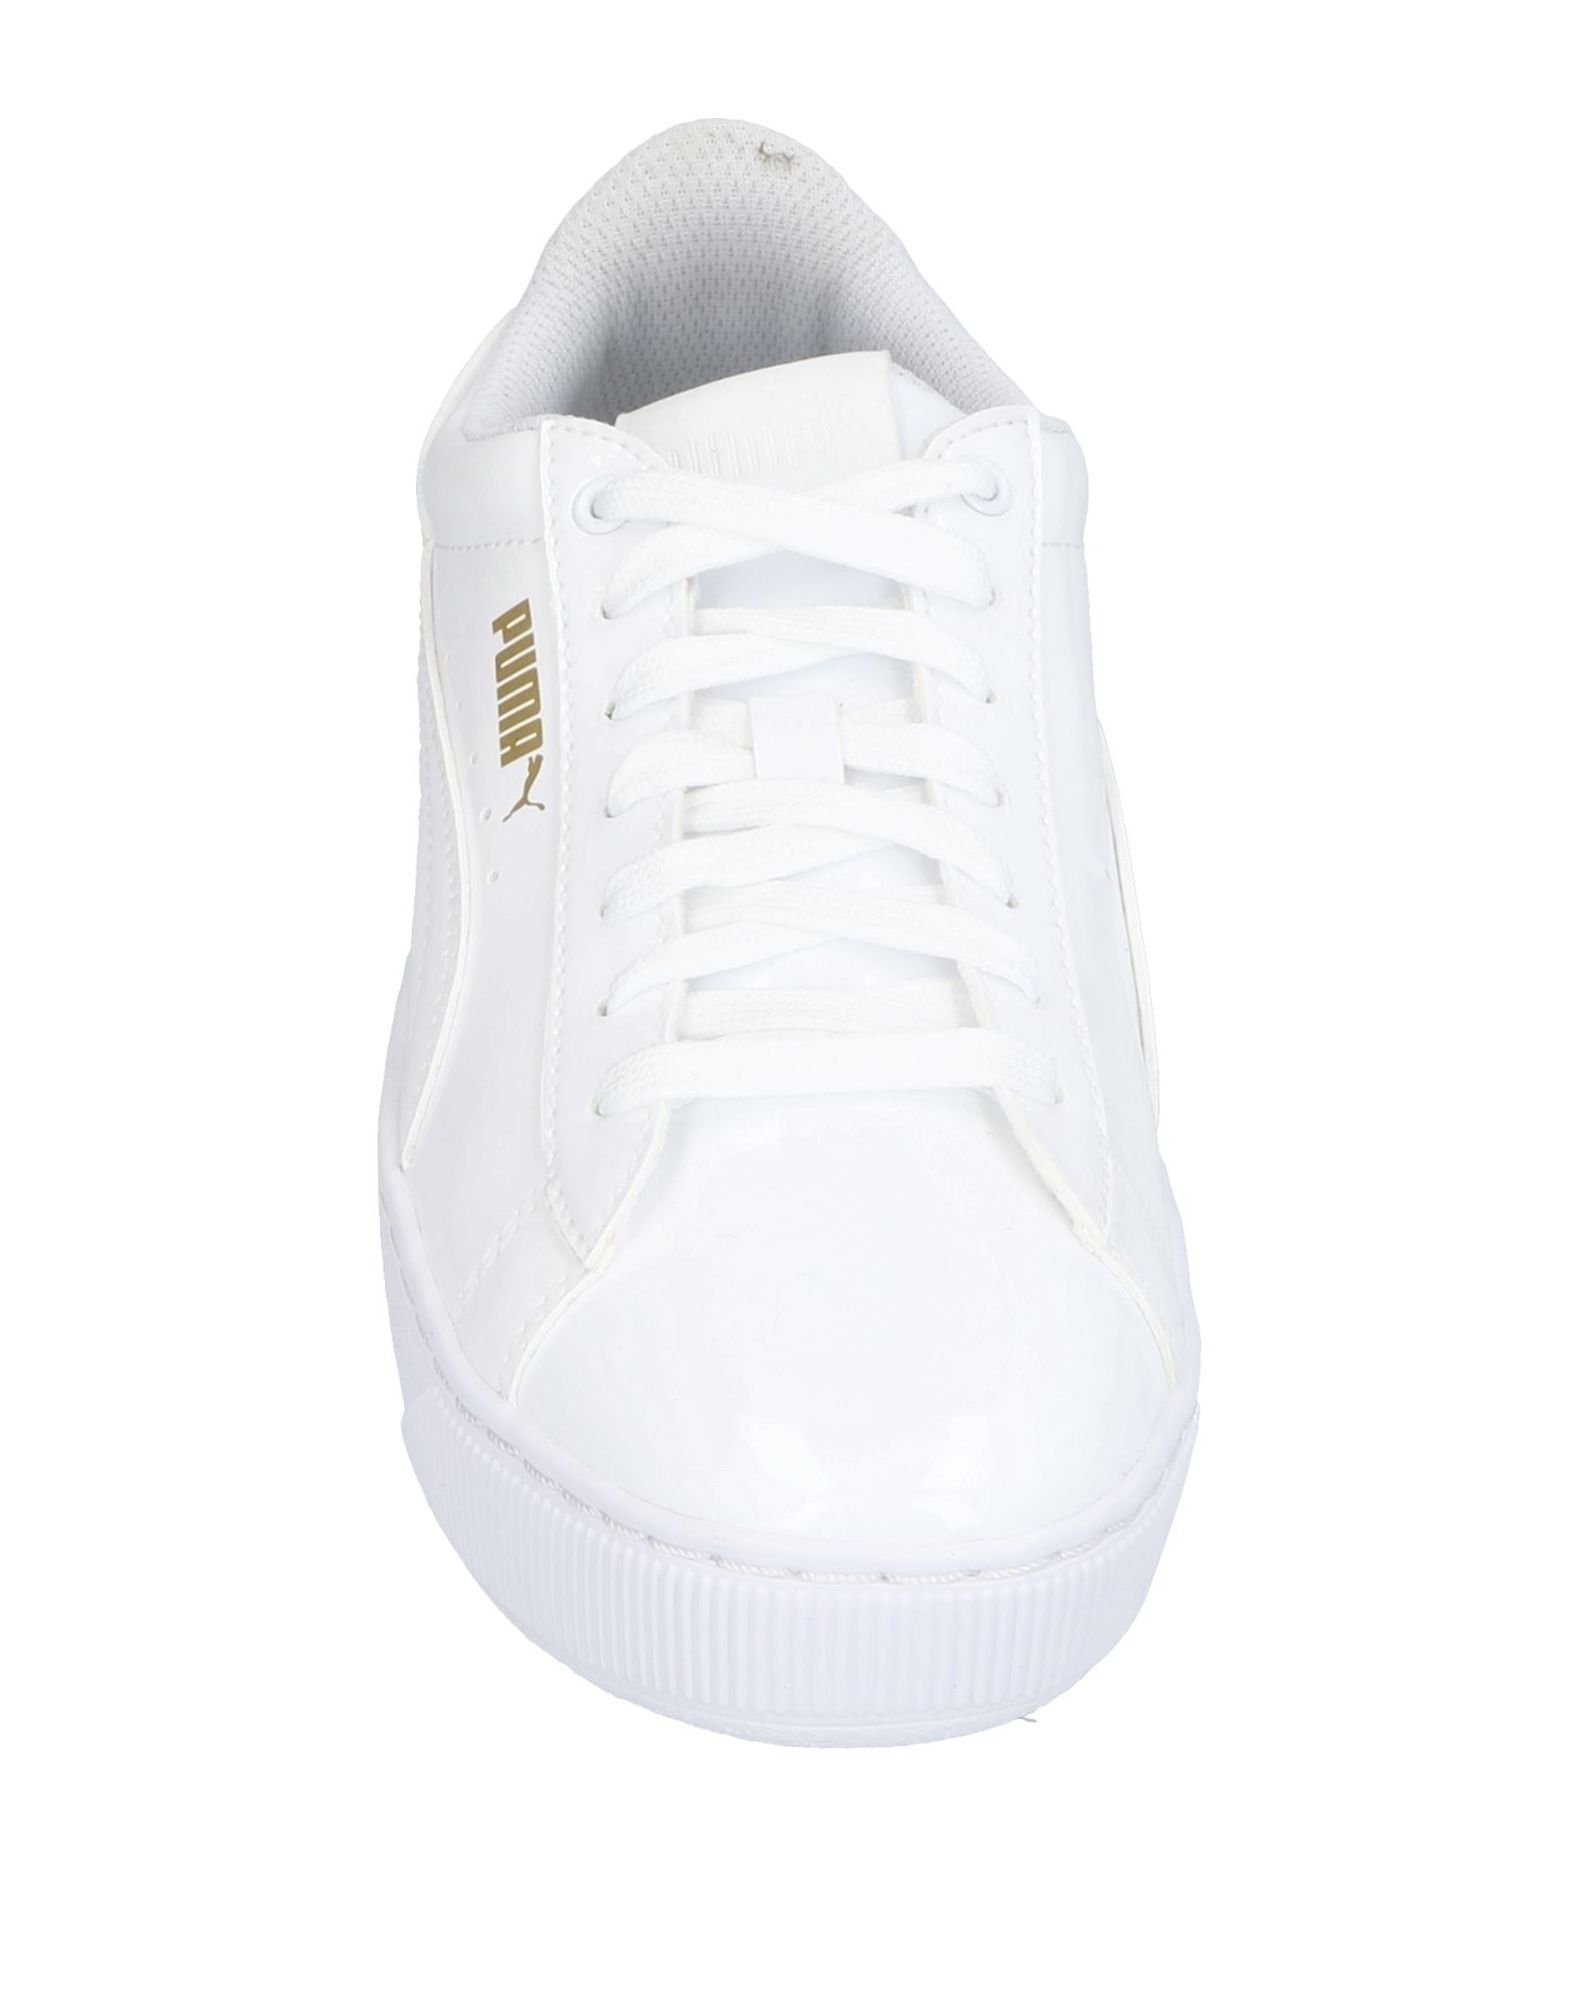 Günstige und modische Schuhe Puma Sneakers Damen  11457144QJ